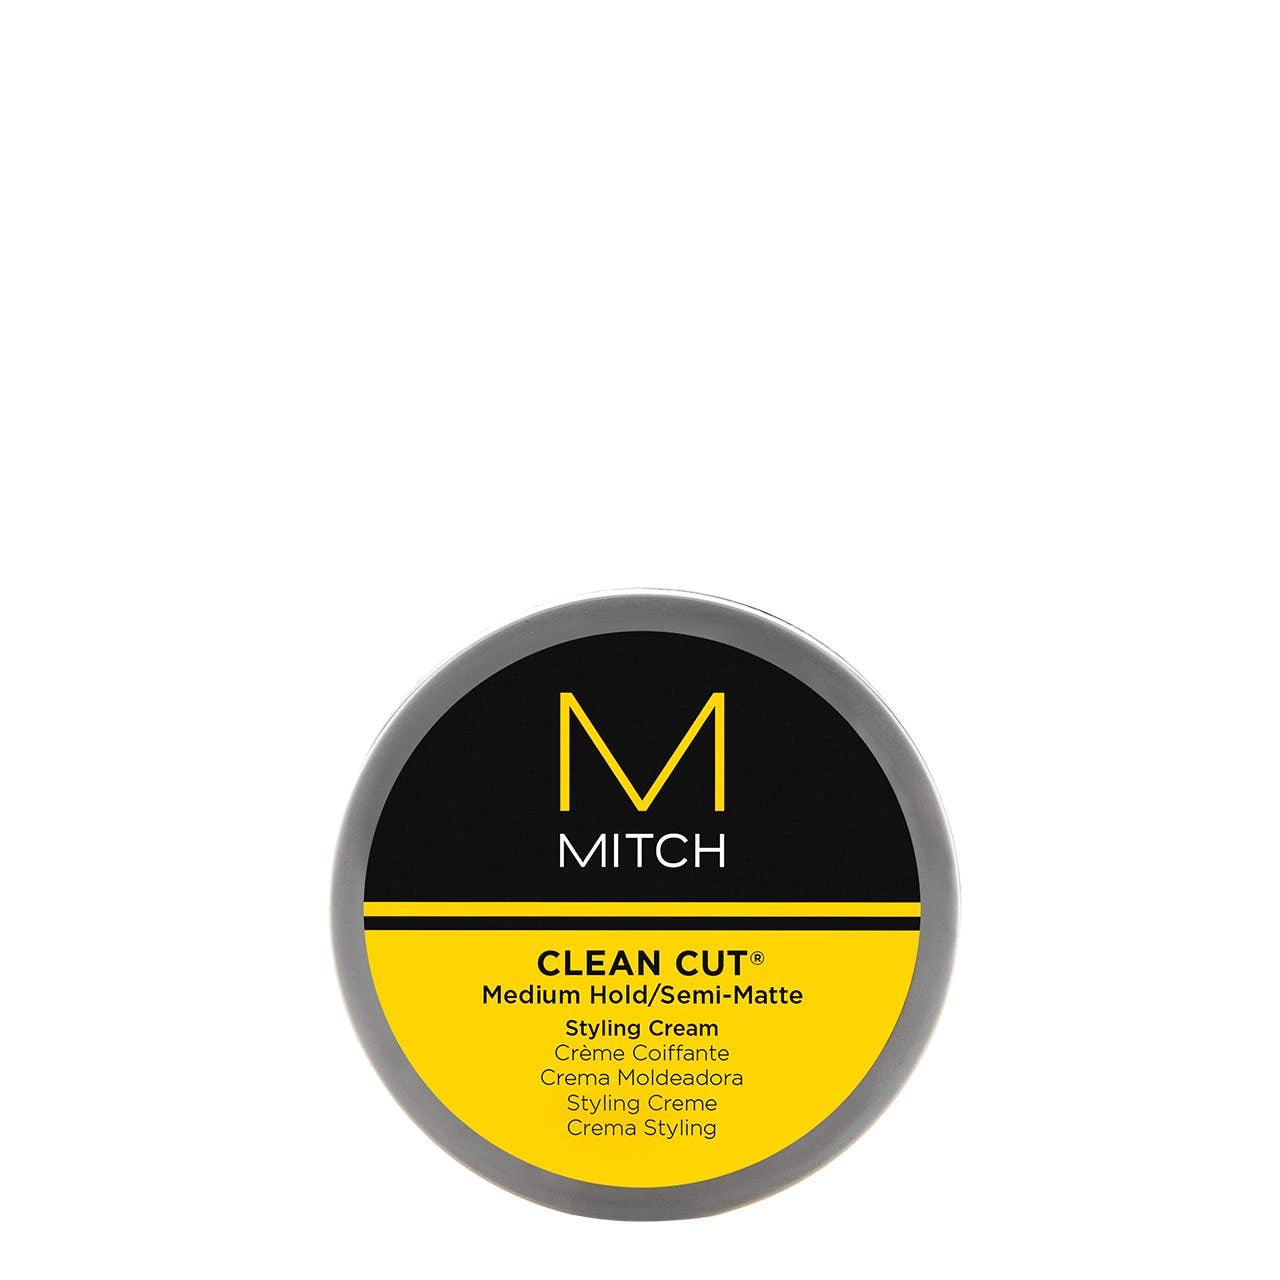 Clean Cut Styling Cream